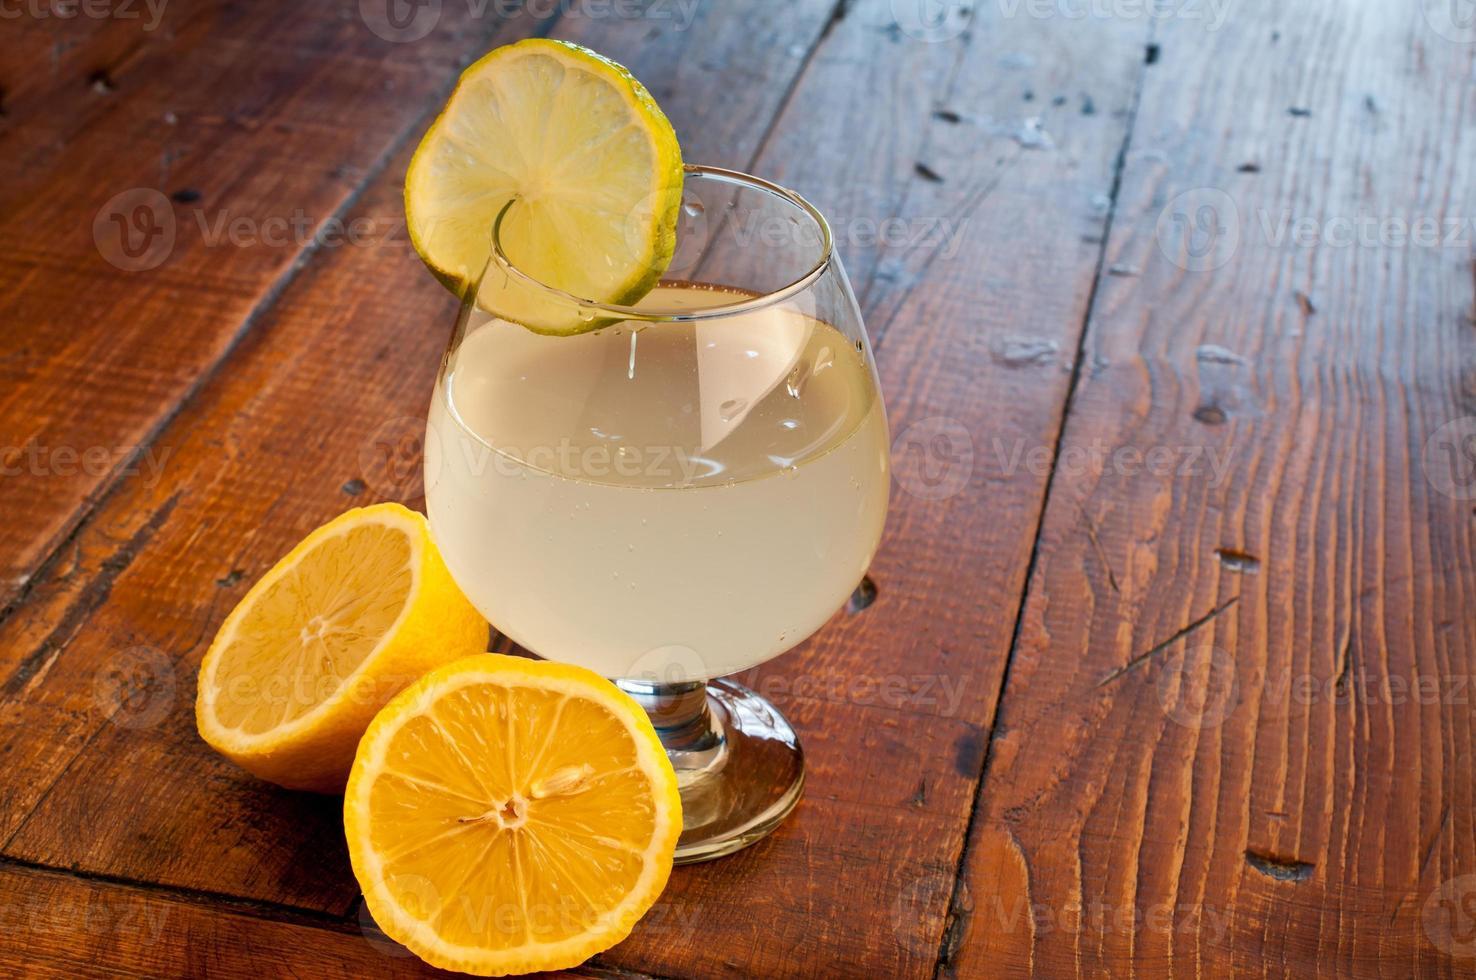 vinglas med mousserande limonadcitronskivad skivkalk foto